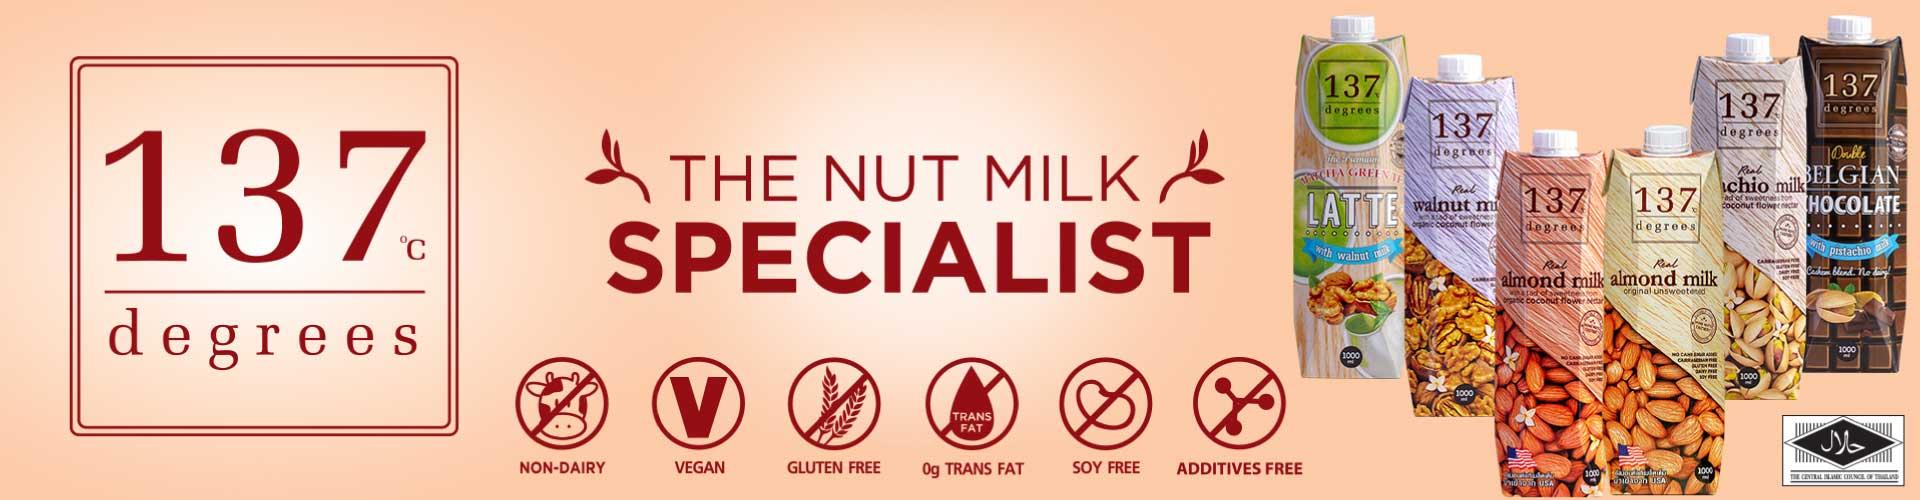 137 Degrees Almond Milk in Malaysia